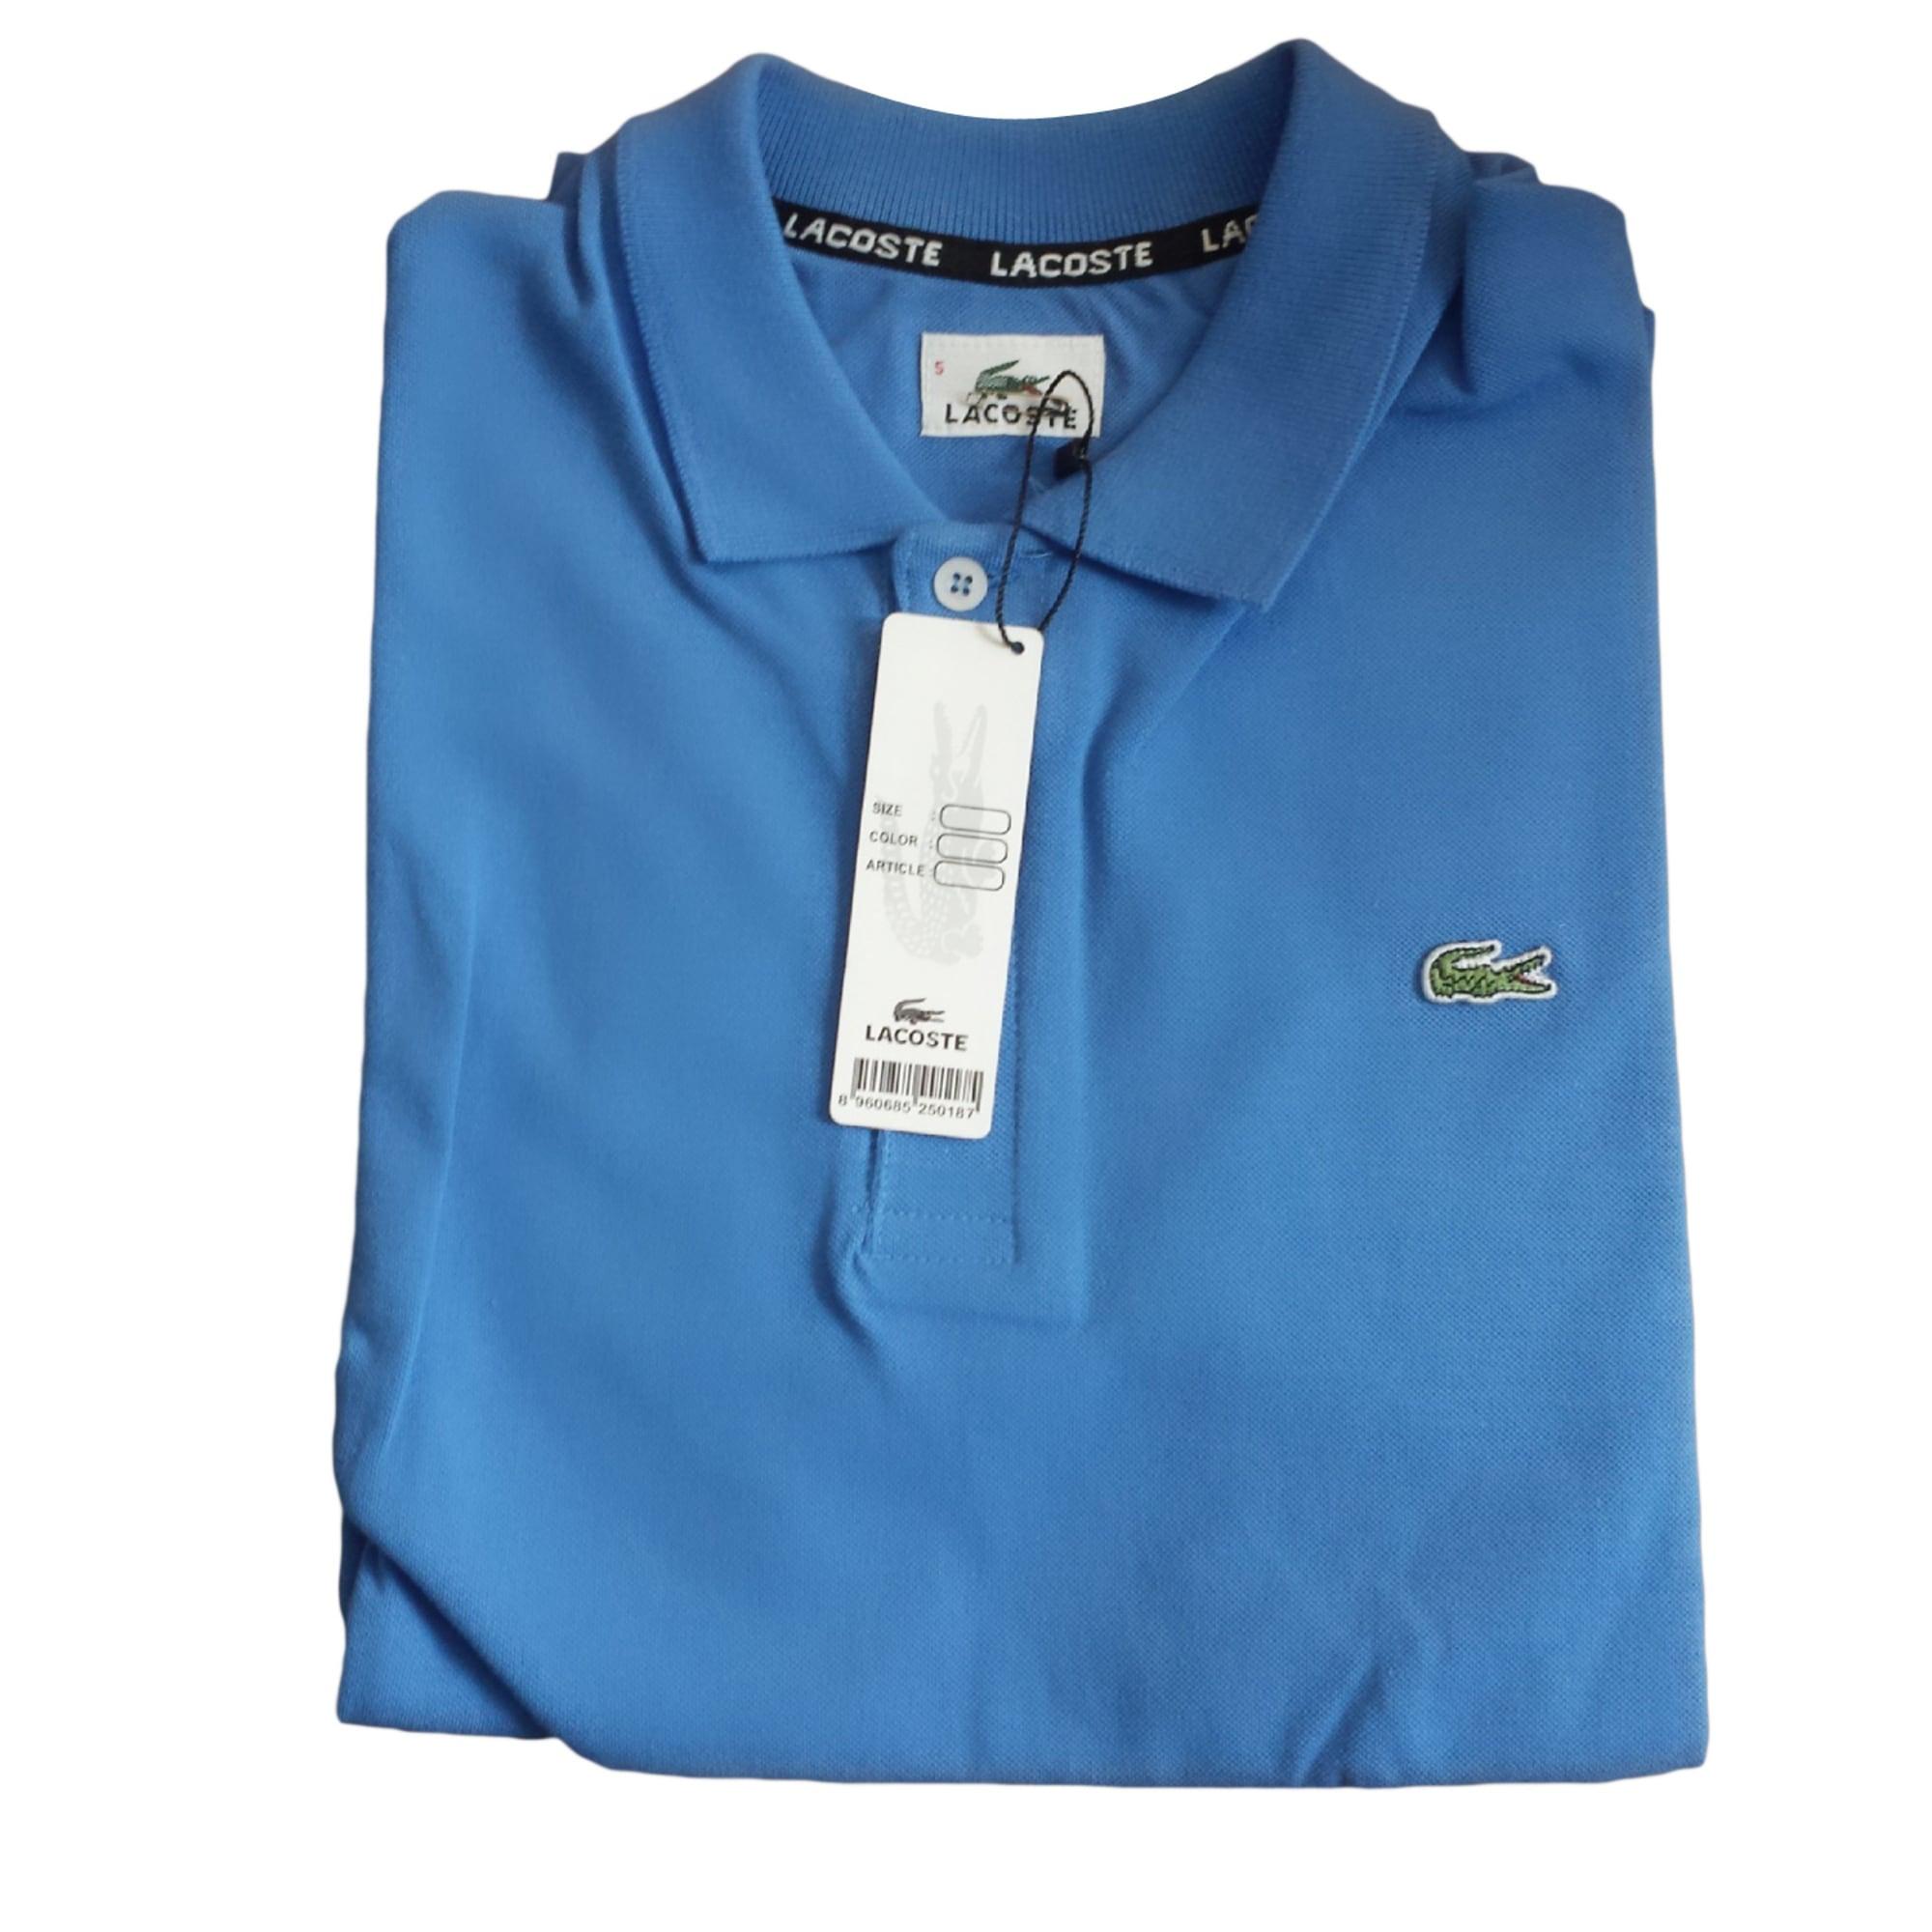 fabe732e84 Polo LACOSTE Bleu, bleu marine, bleu turquoise